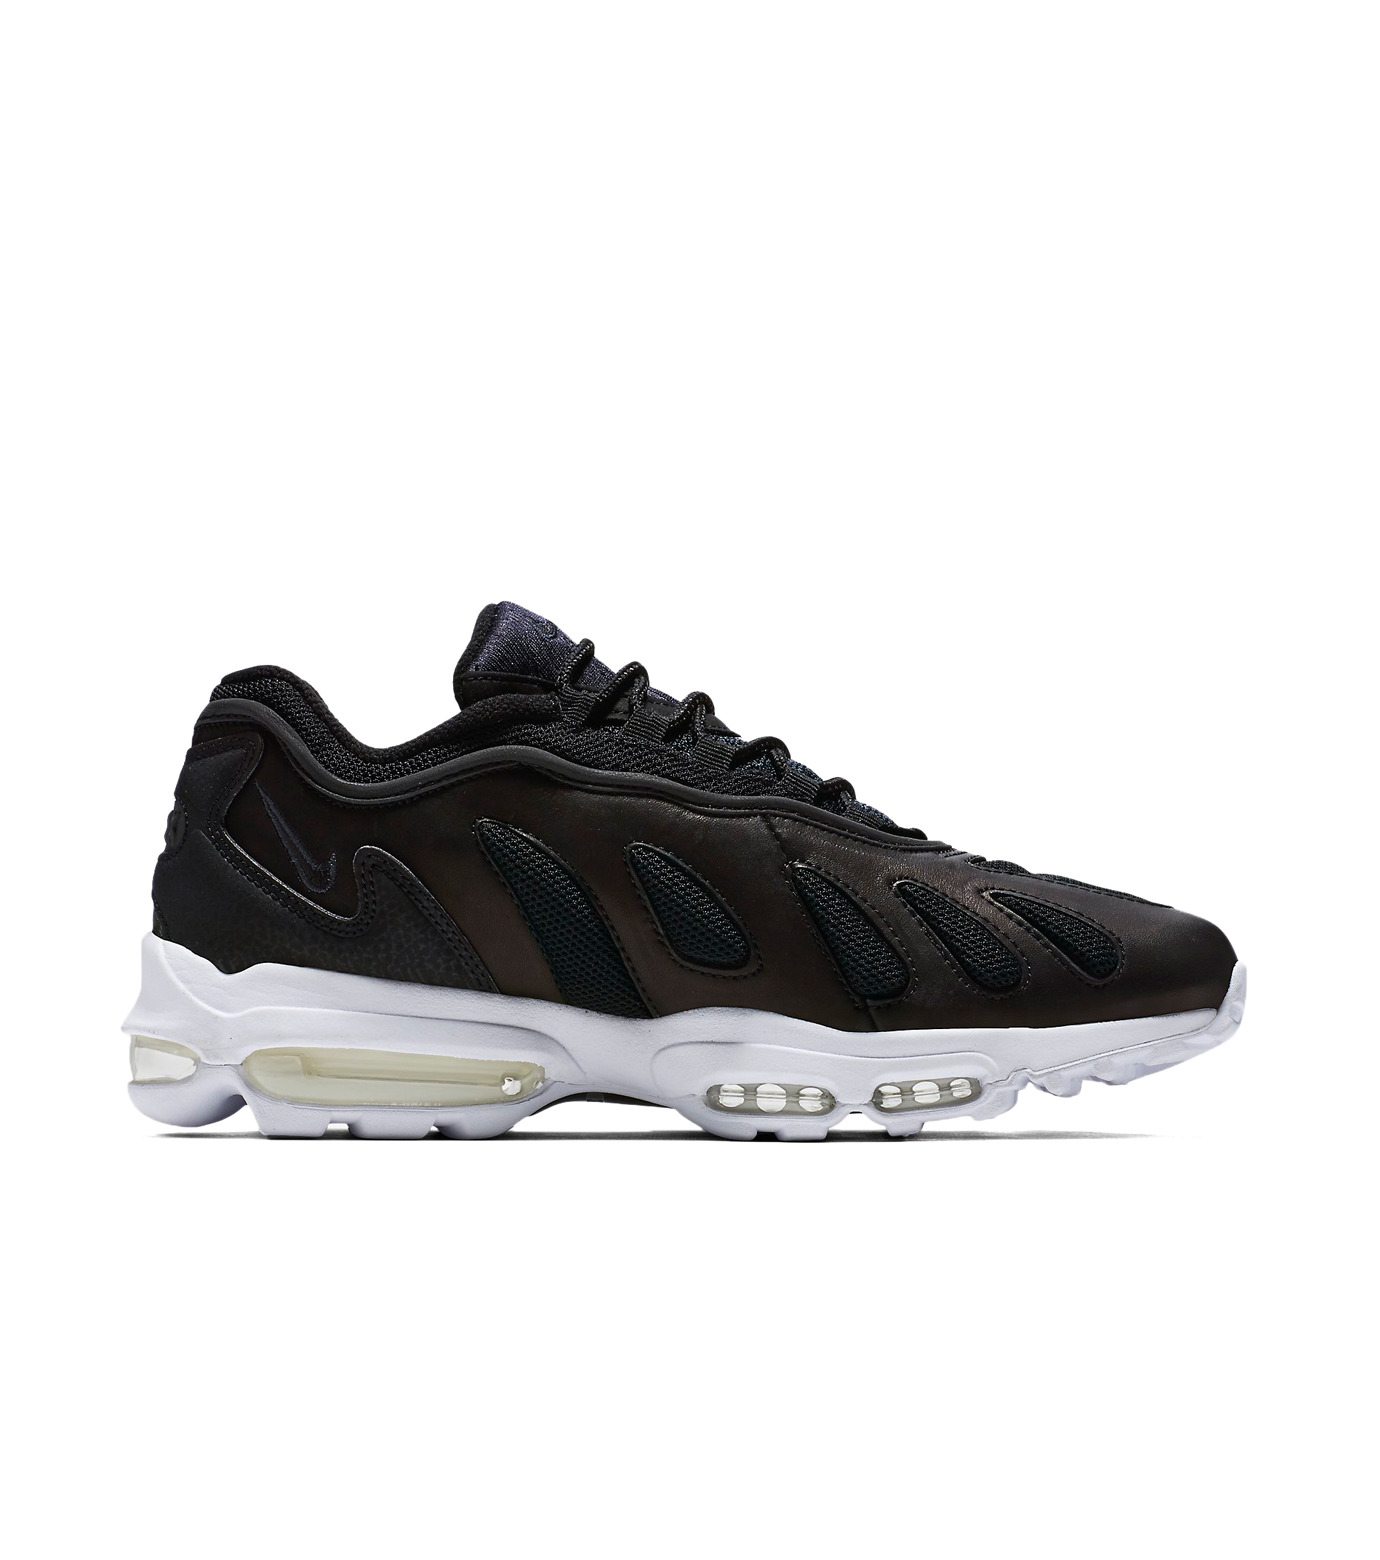 NIKE(ナイキ)のAIR MAX 96 XX-BLACK(シューズ/shoes)-870165-002-13 拡大詳細画像1